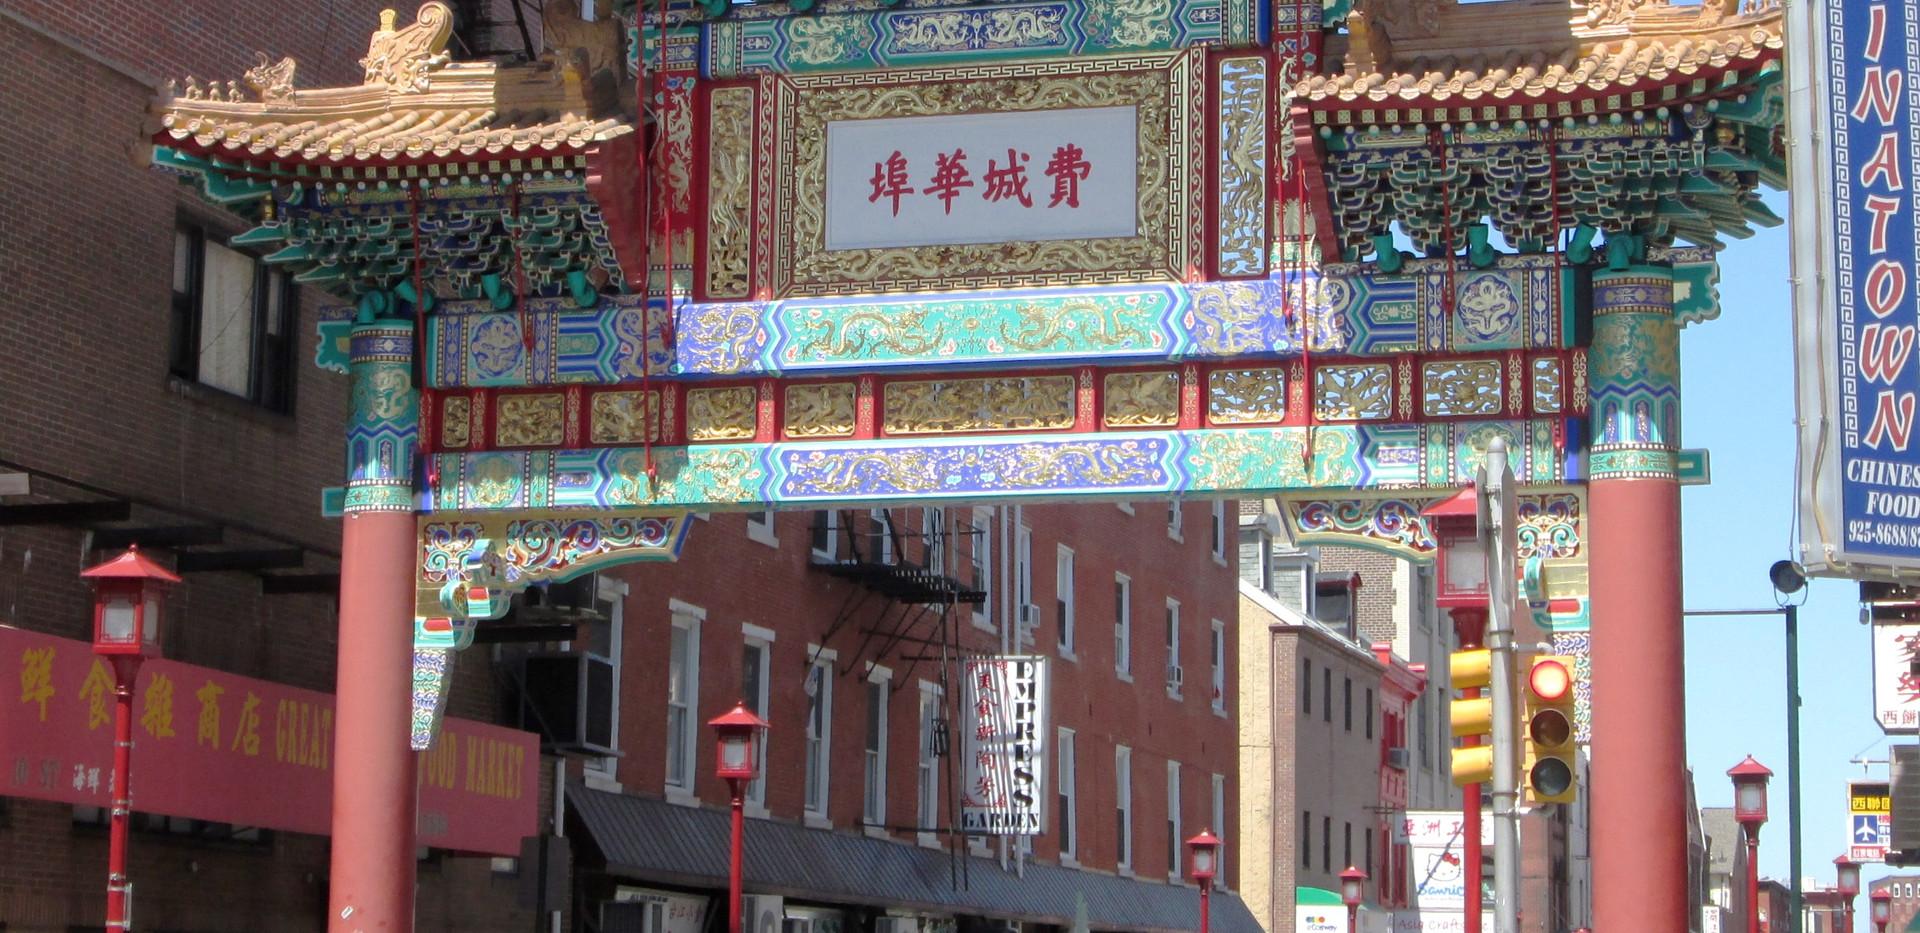 PhiladelphiaFriendship_Gate_Chinatown_Ph